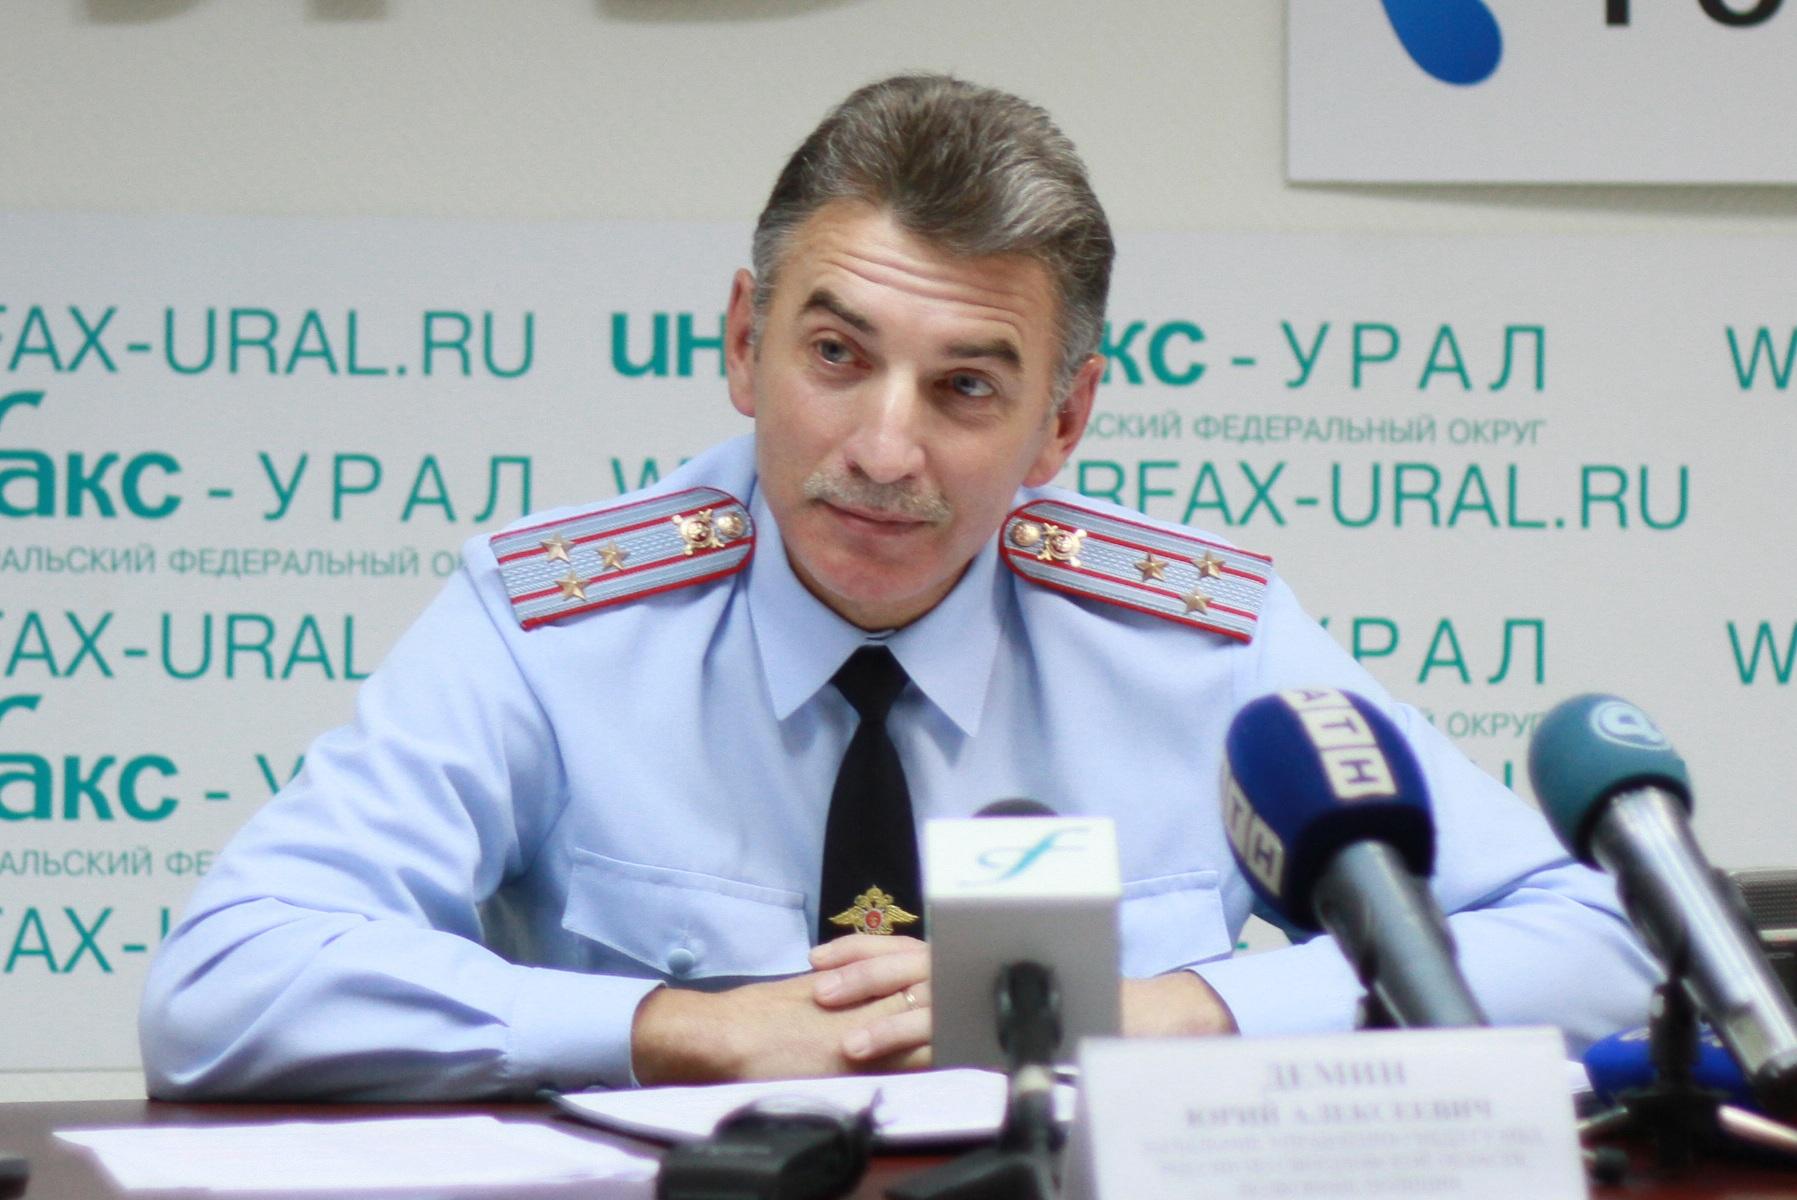 Юрий Дёмин пообещал установить еще 15 постов камер фиксации нарушений